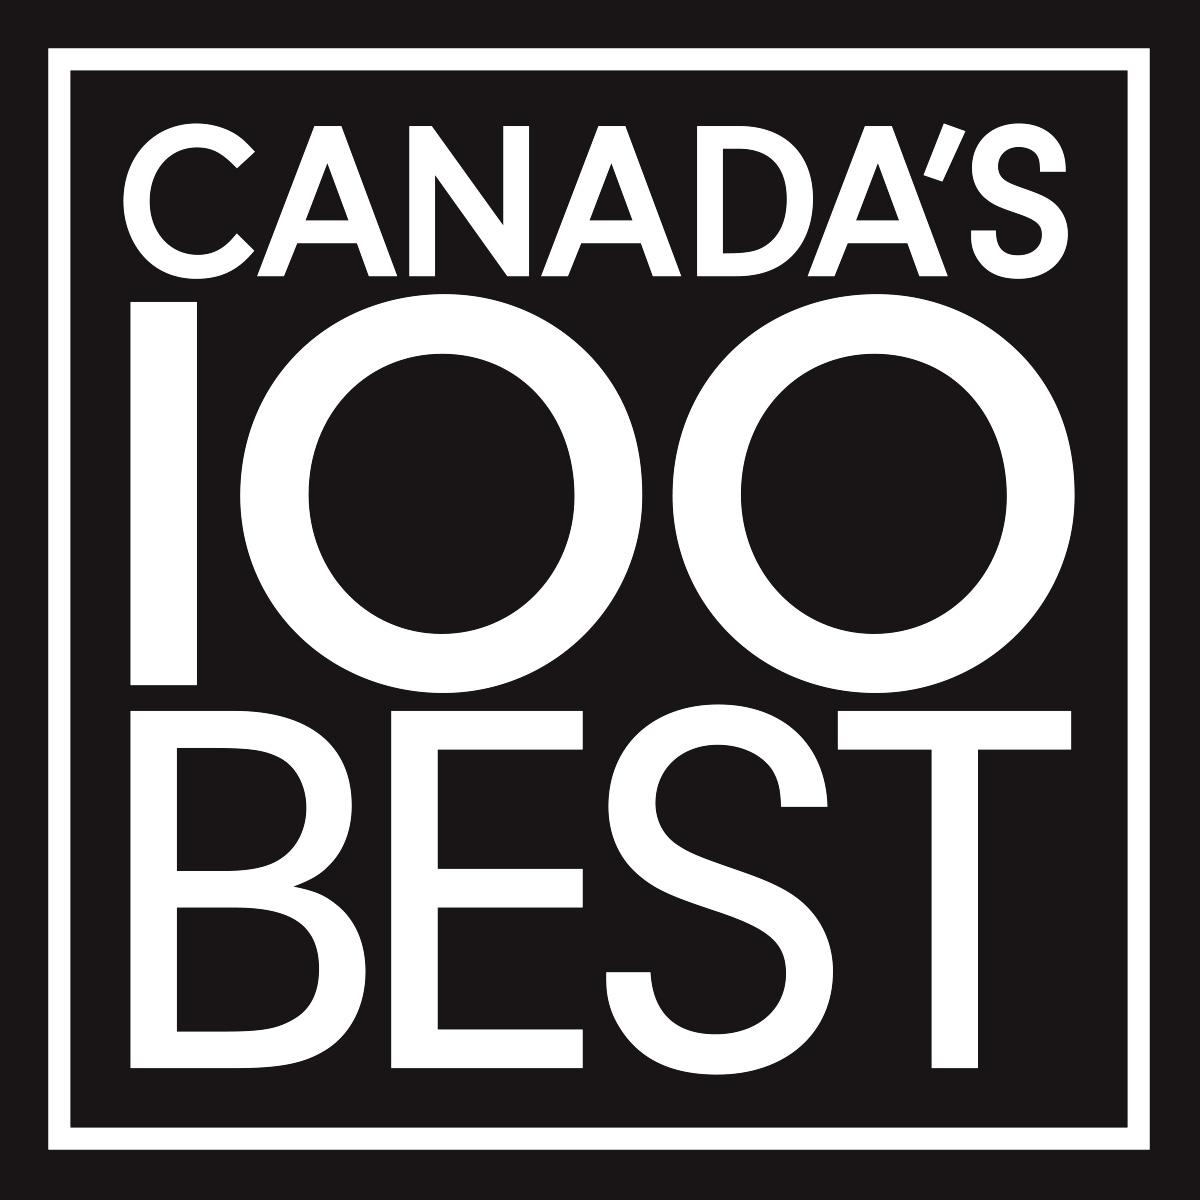 canadas100best_profile_logo.jpg